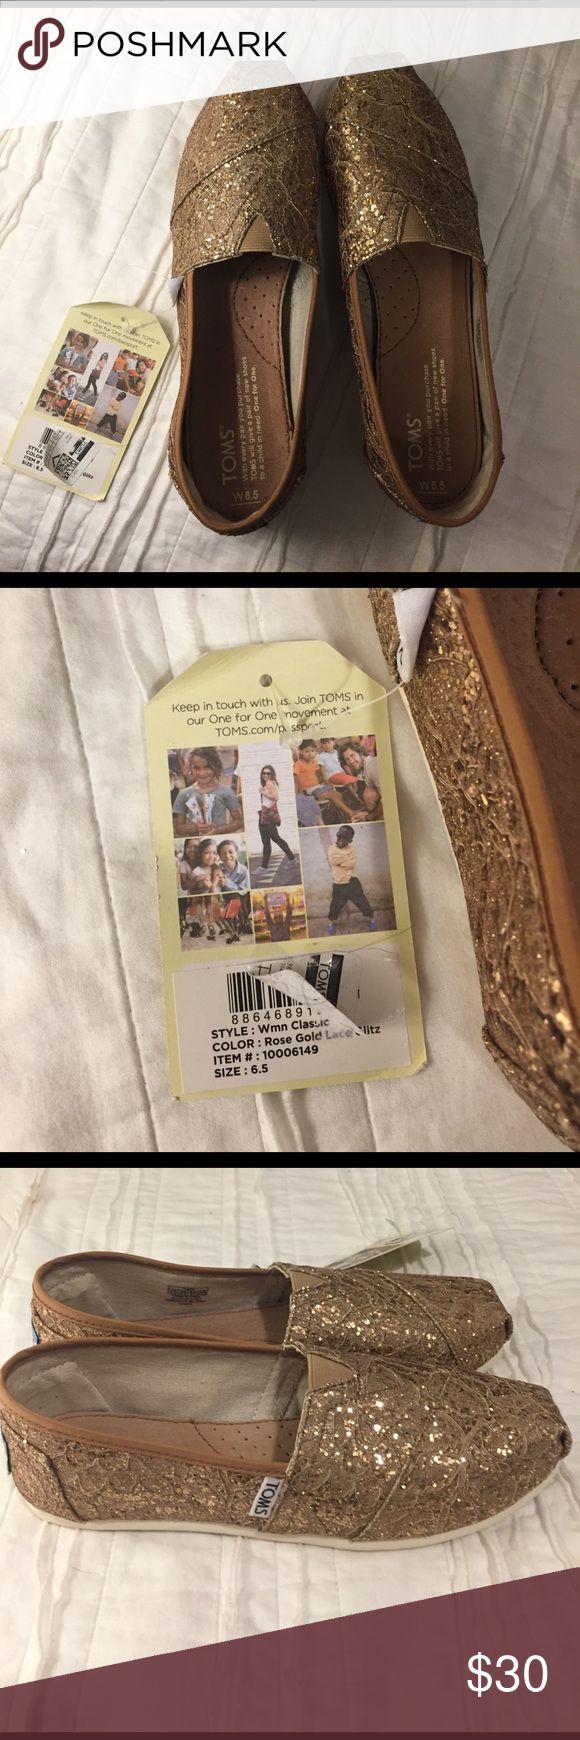 6.5 Toms Rose Gold Lace Glitz Beautifully shiny, new with tags Toms shoes in 6.5 Rose Gold Lace Glitz! TOMS Shoes Espadrilles